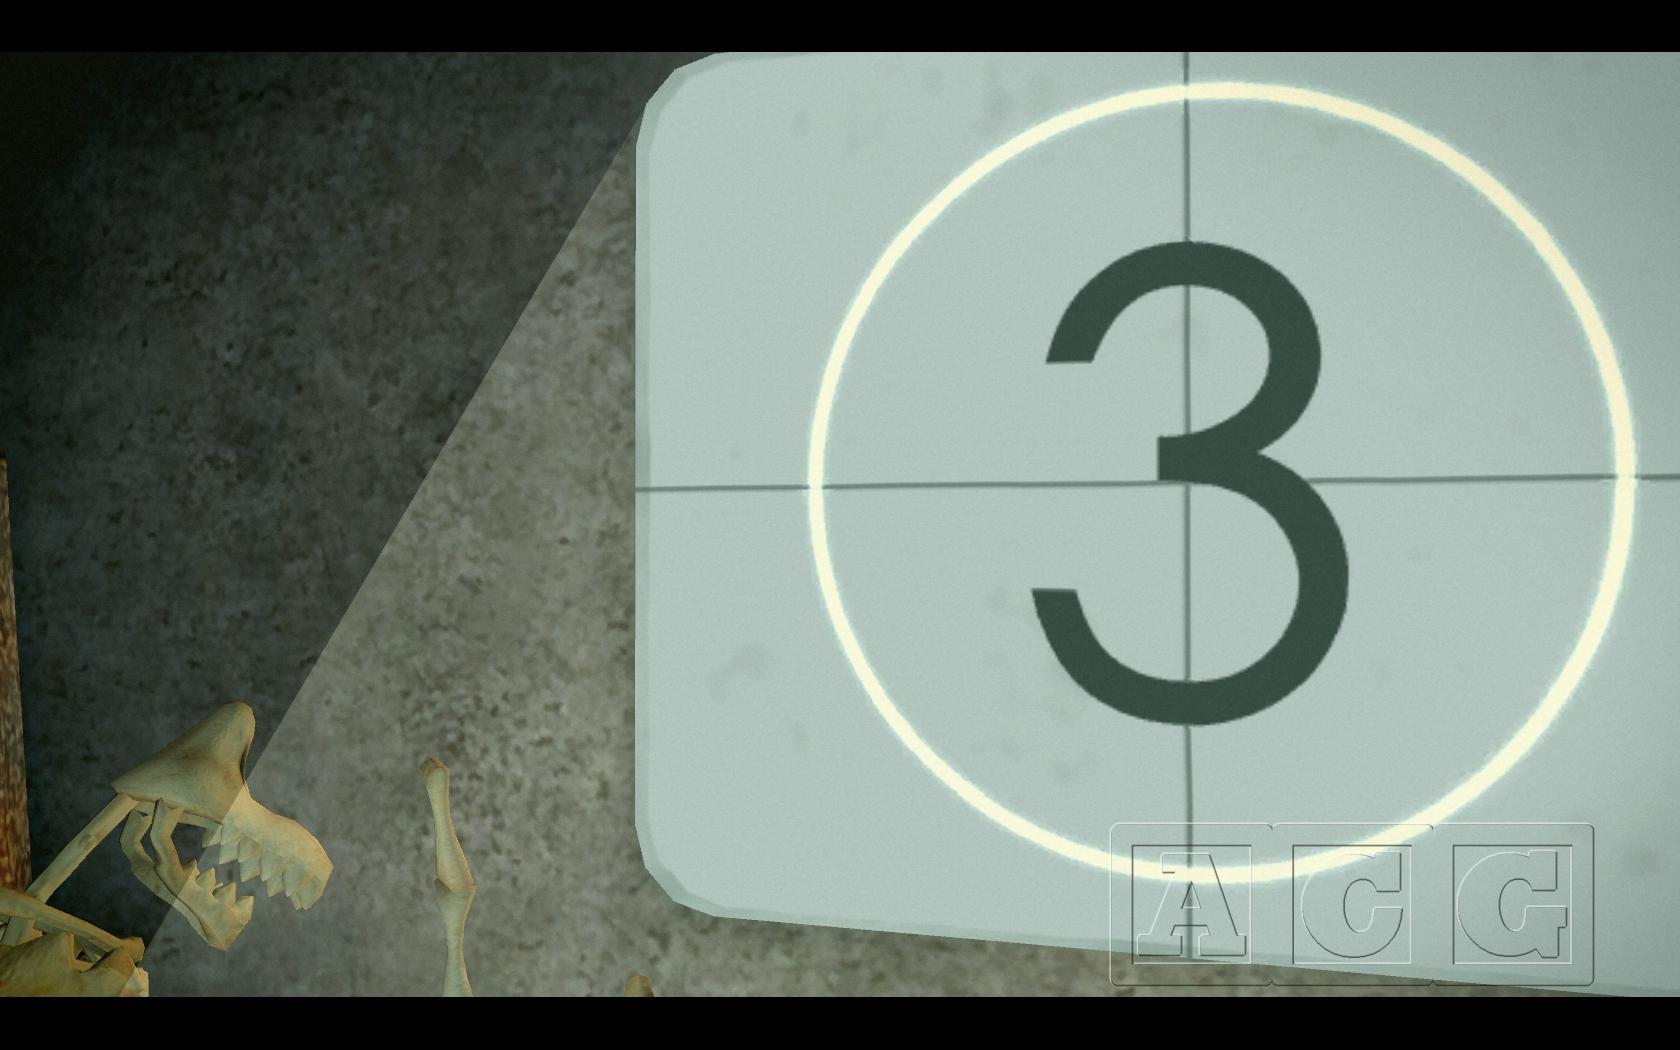 Sam & Max The Devil's Playhouse Episode 302: The Tomb of Sammun-Mak